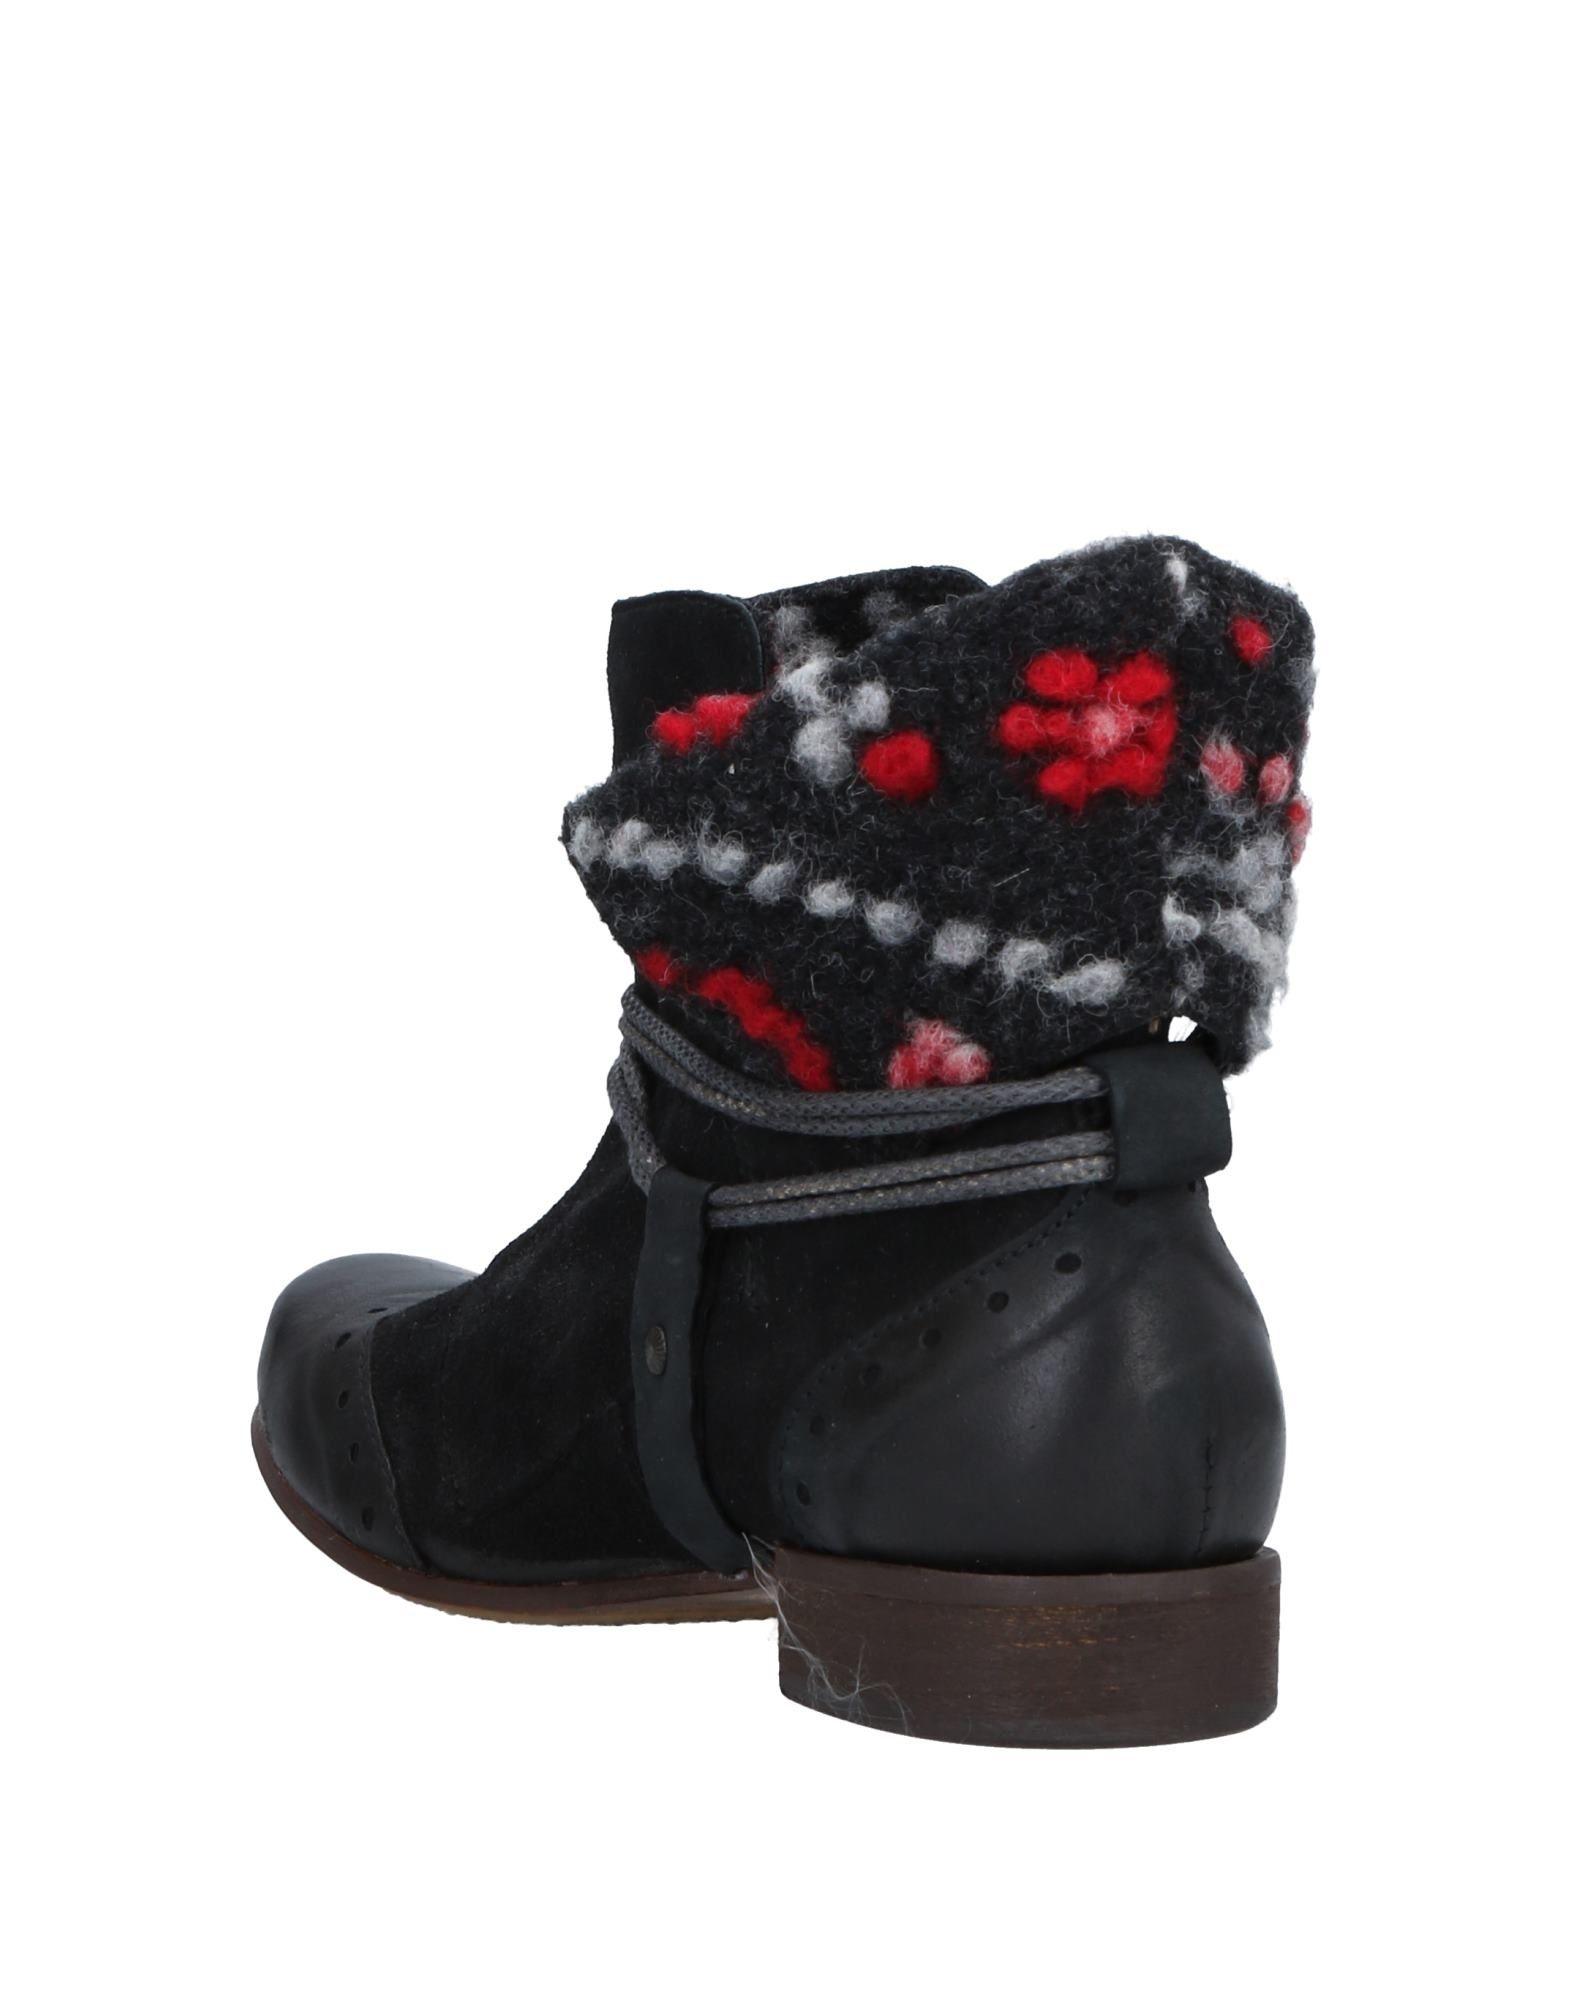 Clocharme Clocharme Ankle Boot - Women Clocharme Clocharme Ankle Boots online on  United Kingdom - 11526011VF a5ac3d